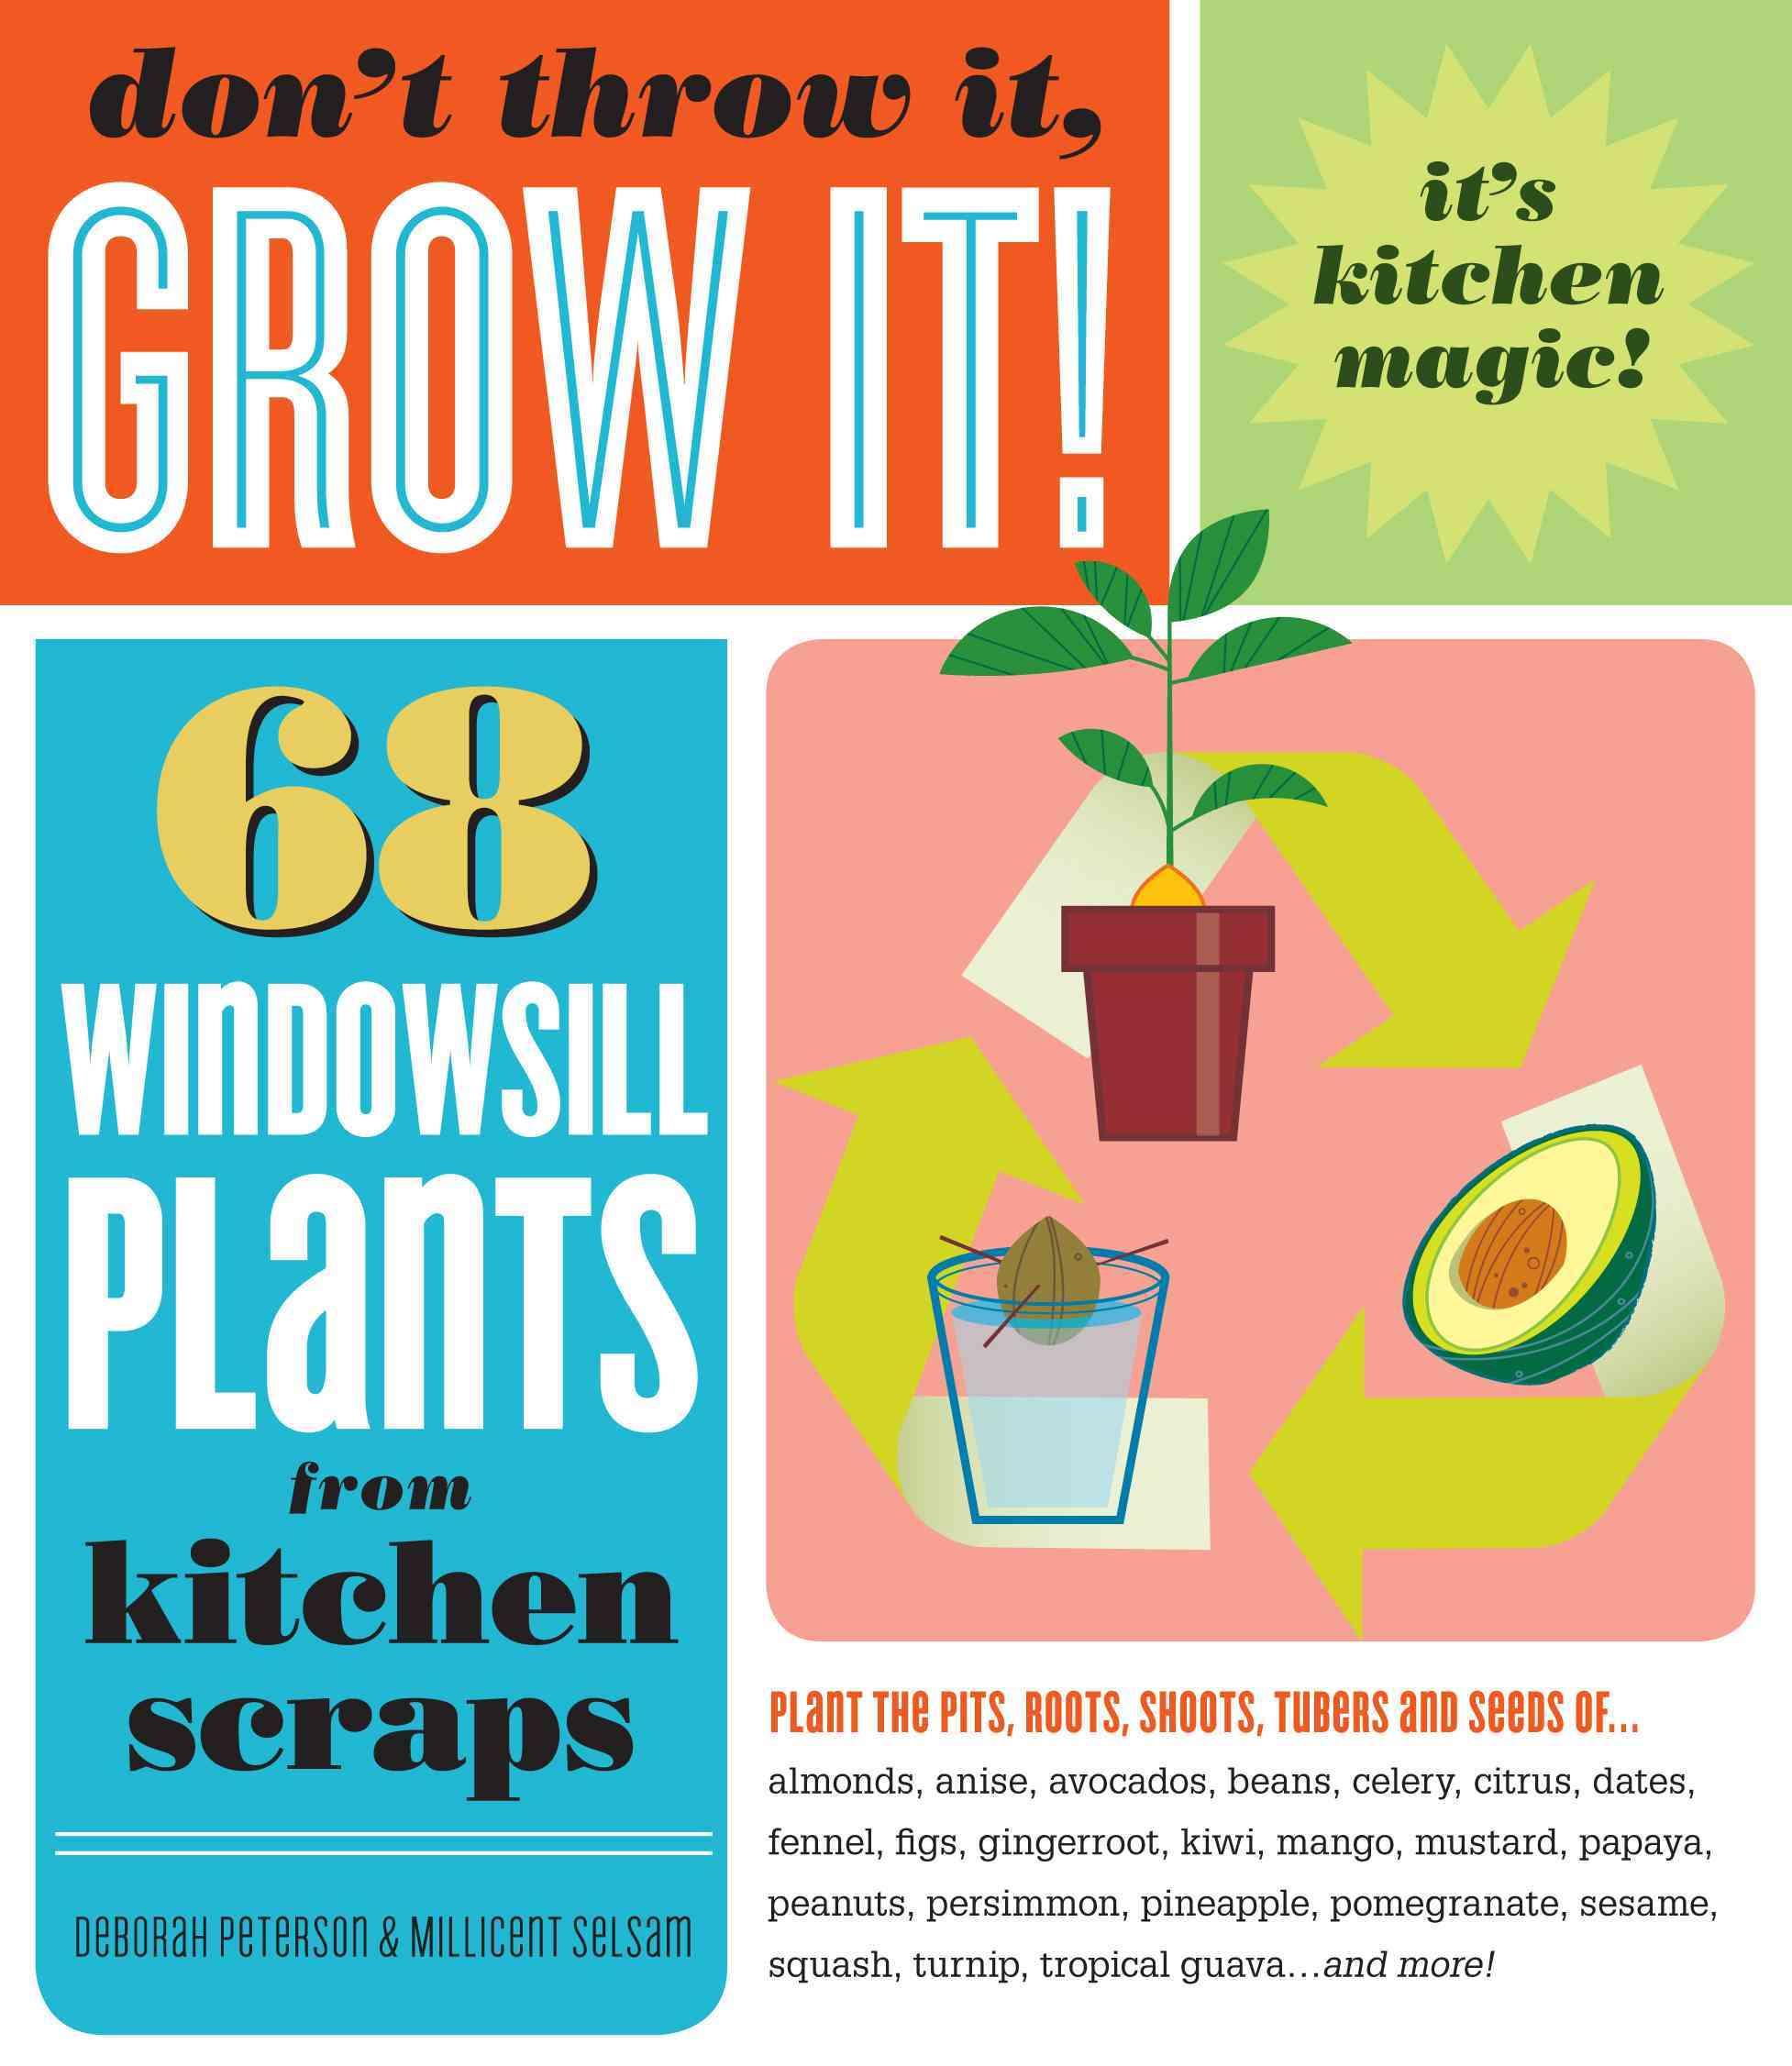 Don't Throw It, Grow It!: 68 Windowsill Plants from Kitchen Scraps (Paperback)